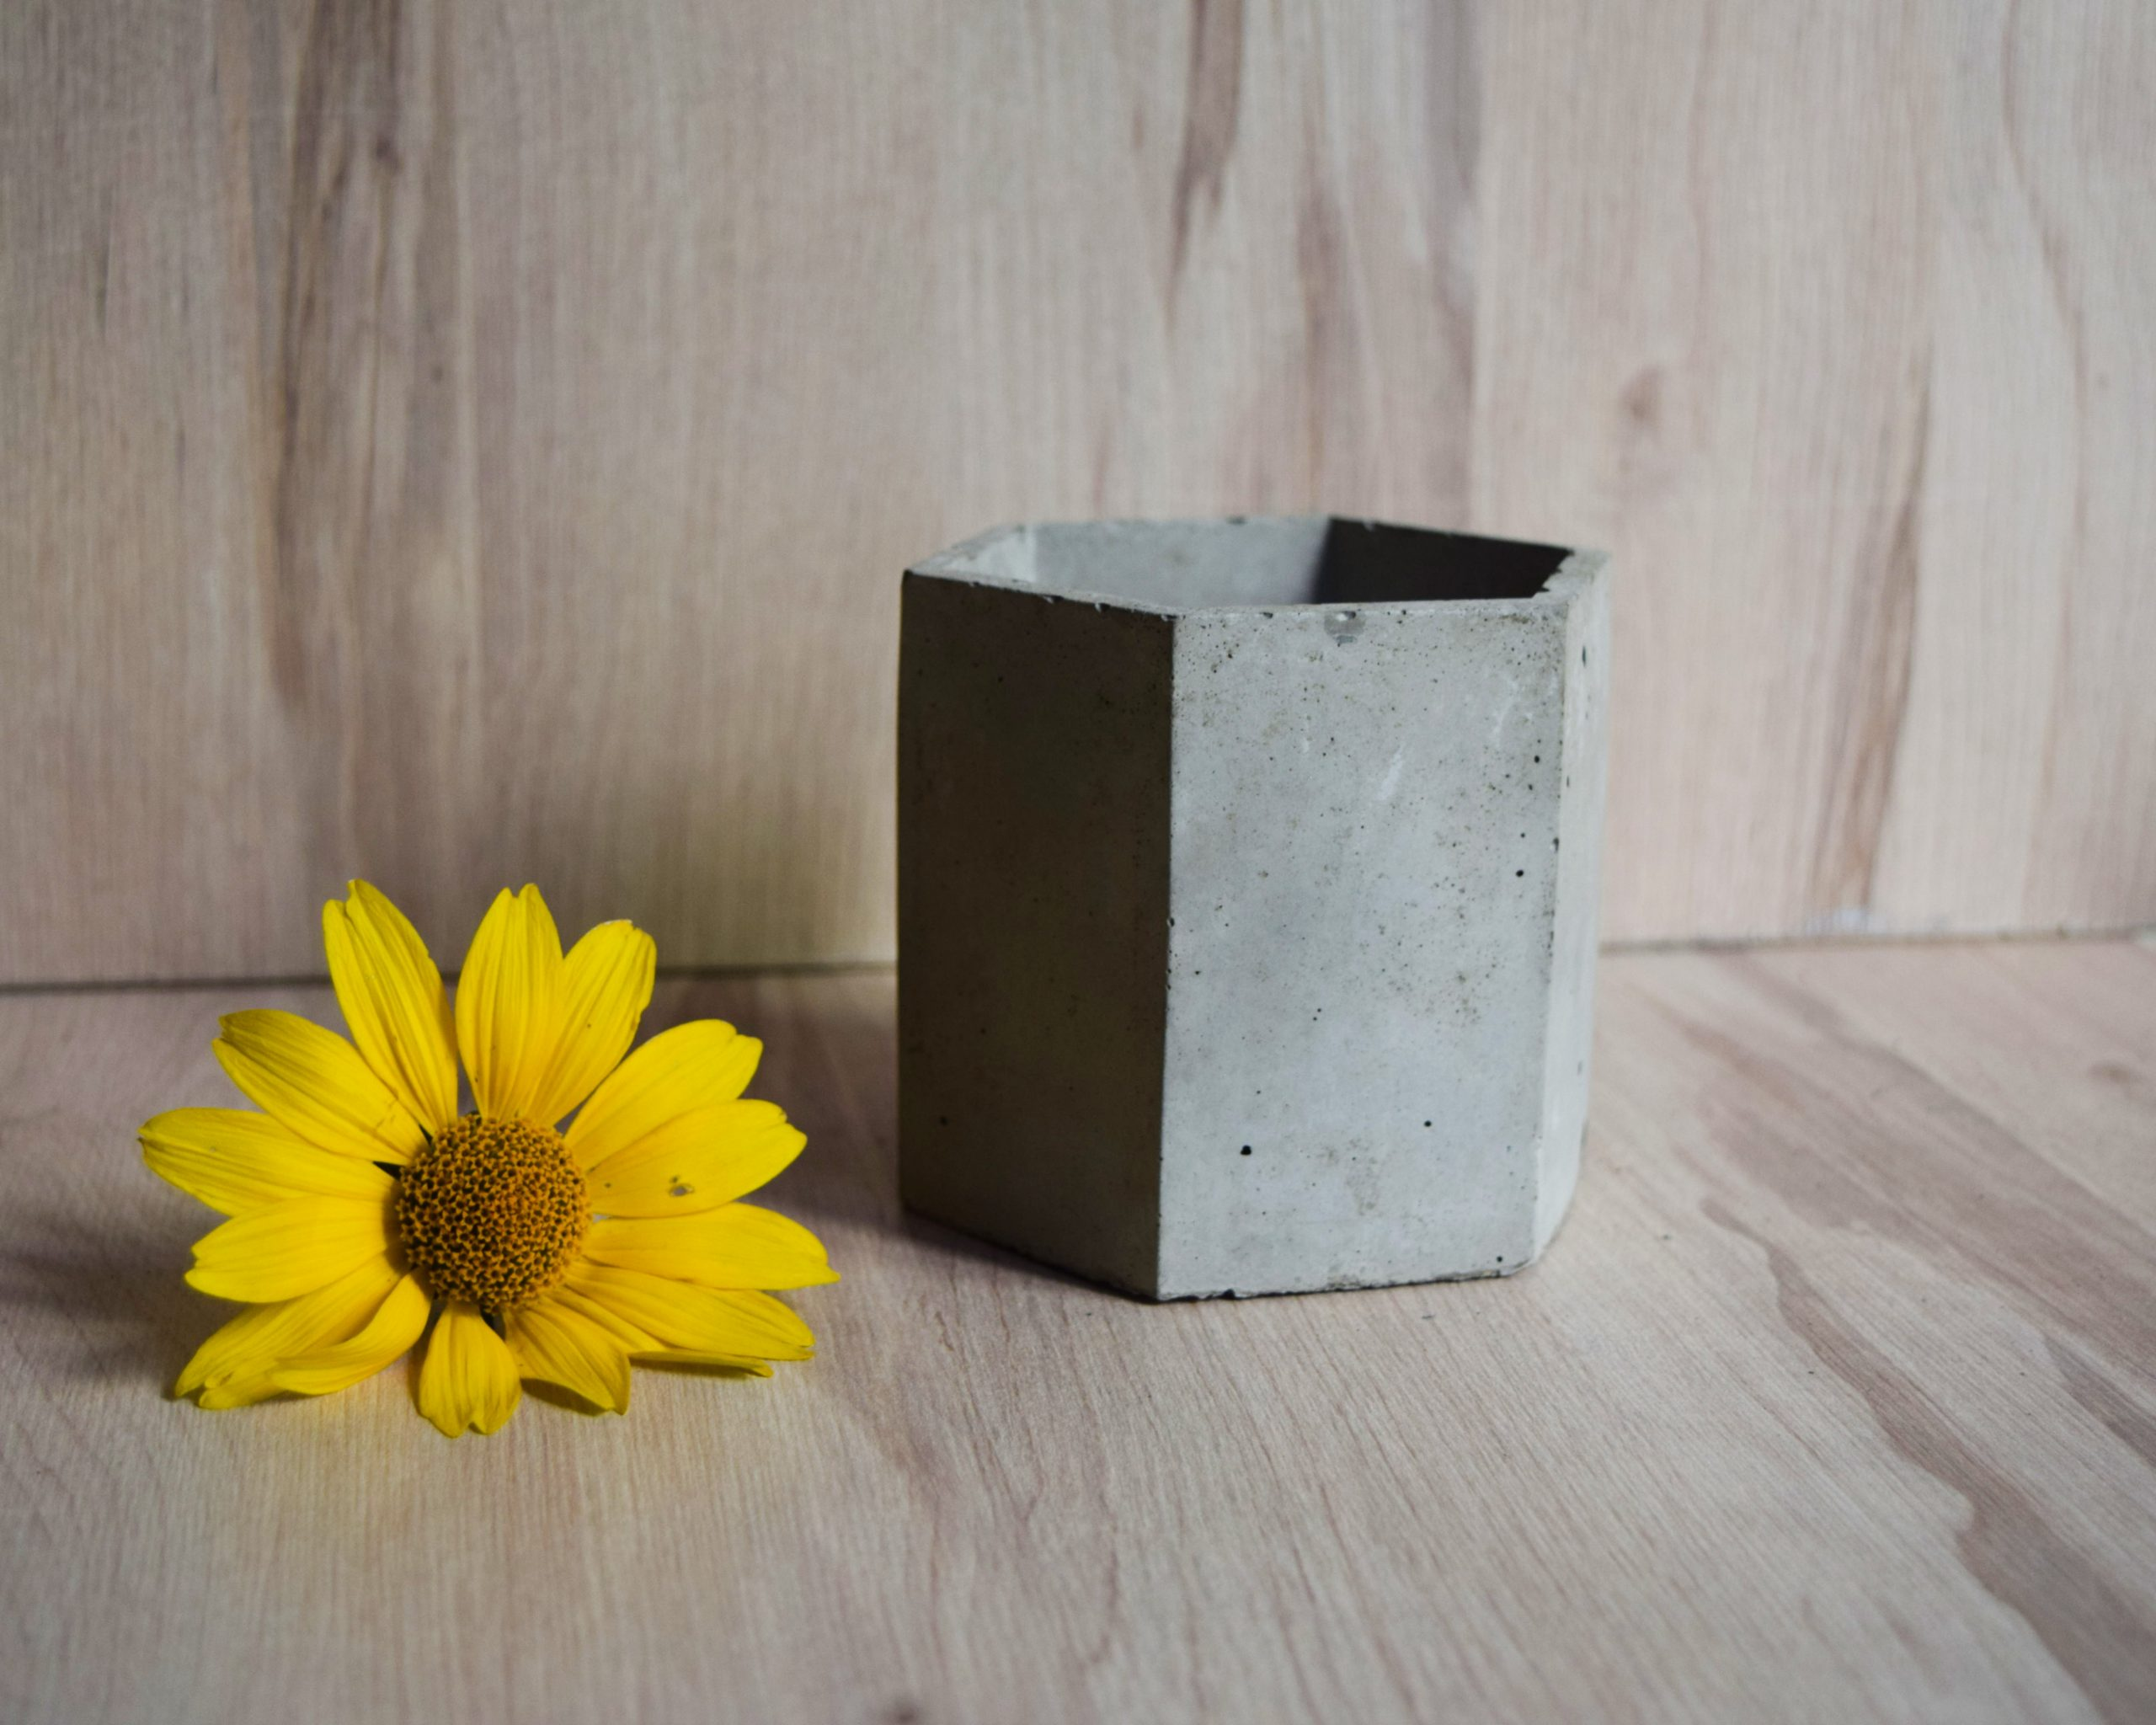 Osłonka betonowa jasnoszara sześciokątna